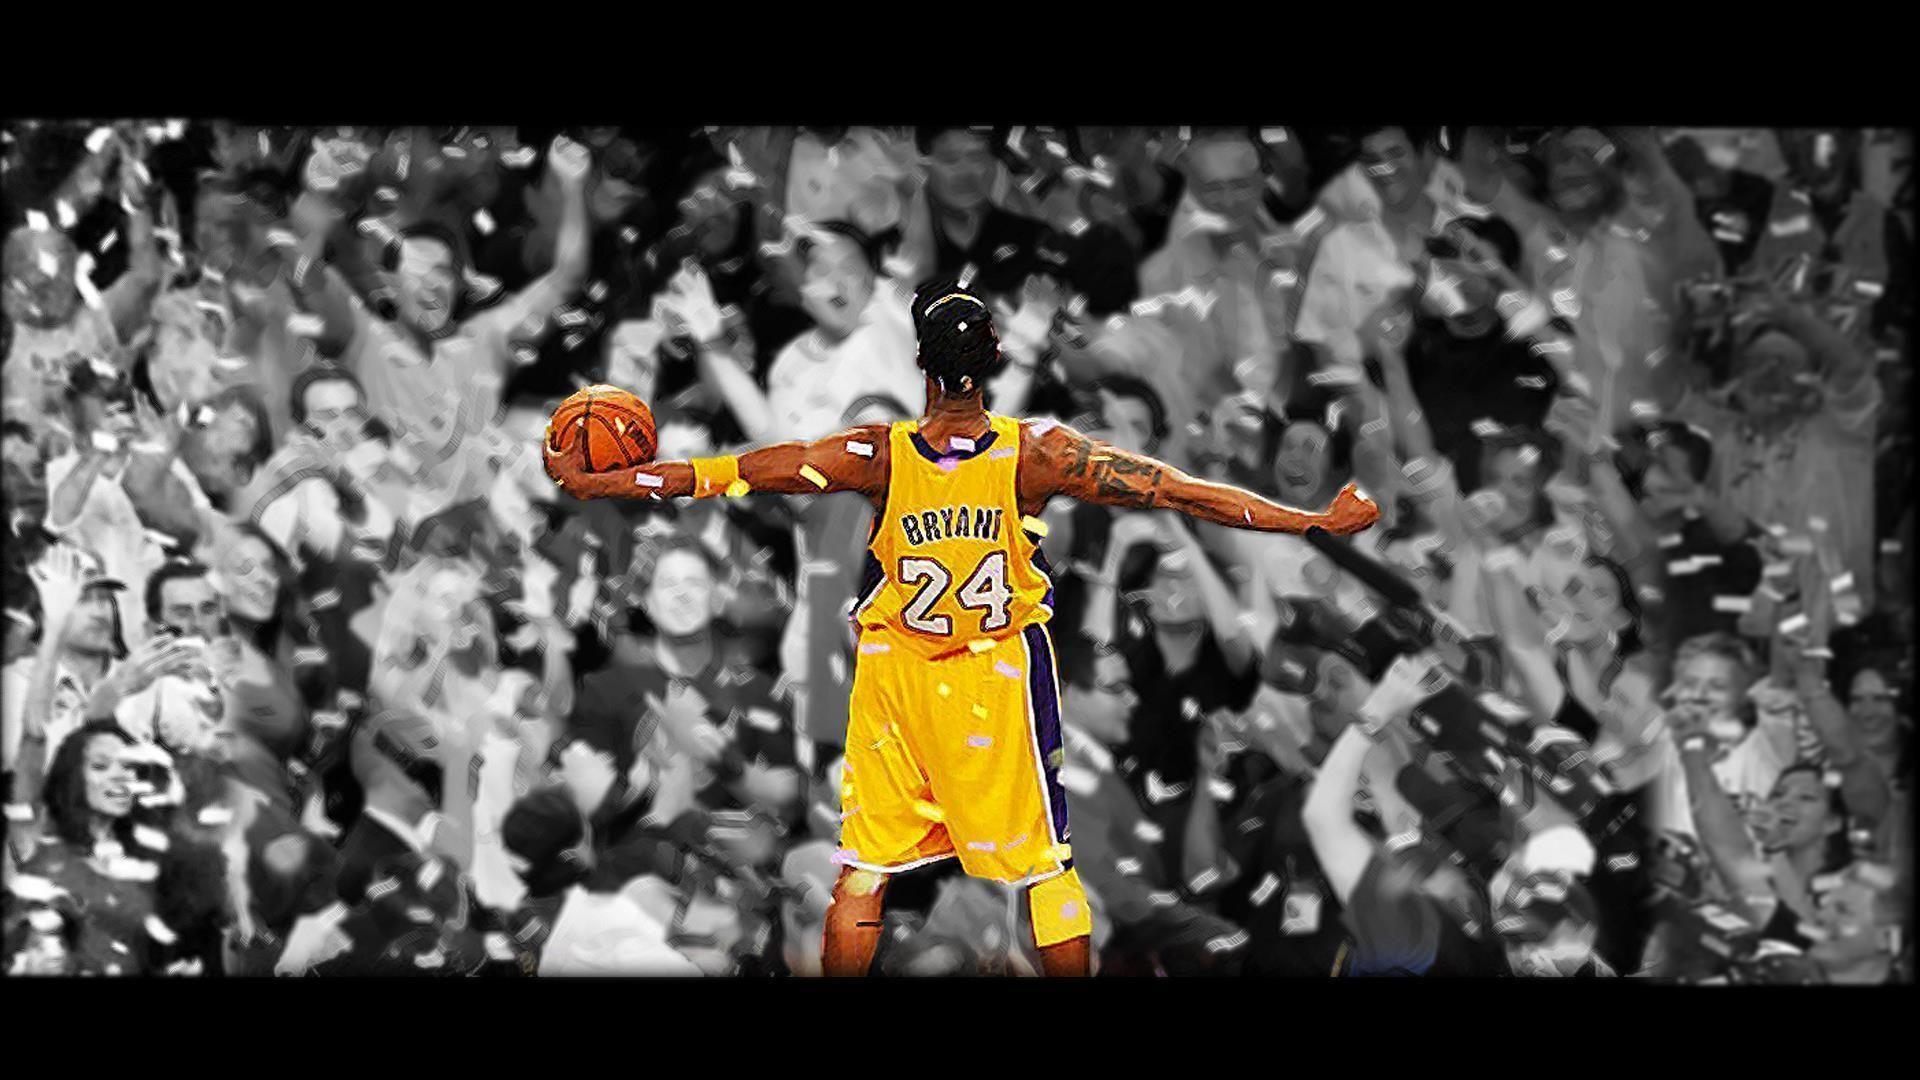 55 Kobe Wallpapers Download At Wallpaperbro Kobe Bryant Wallpaper Kobe Bryant Iphone Wallpaper Kobe Bryant Pictures